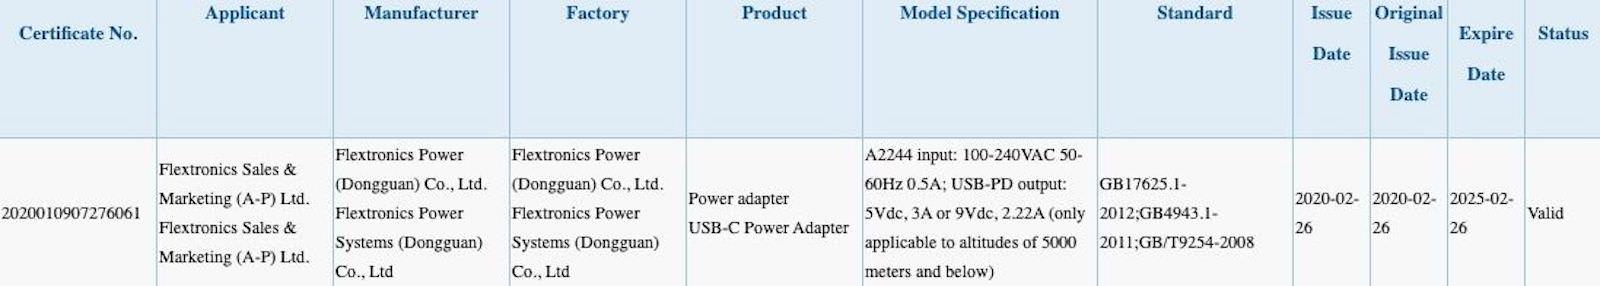 Apple A2244 3C